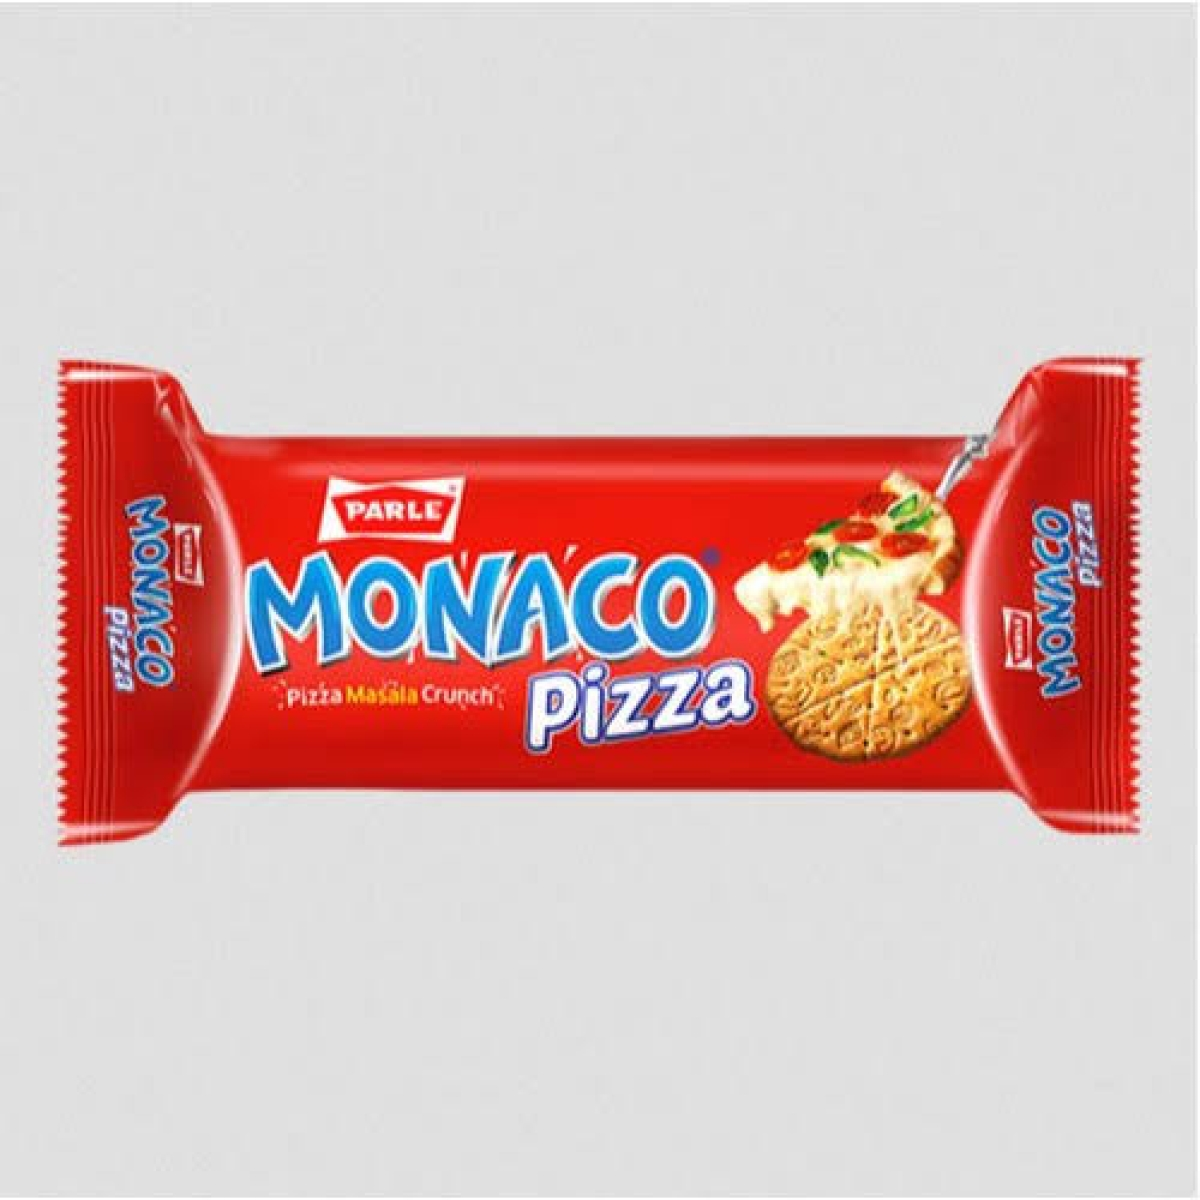 Monaco Pizza